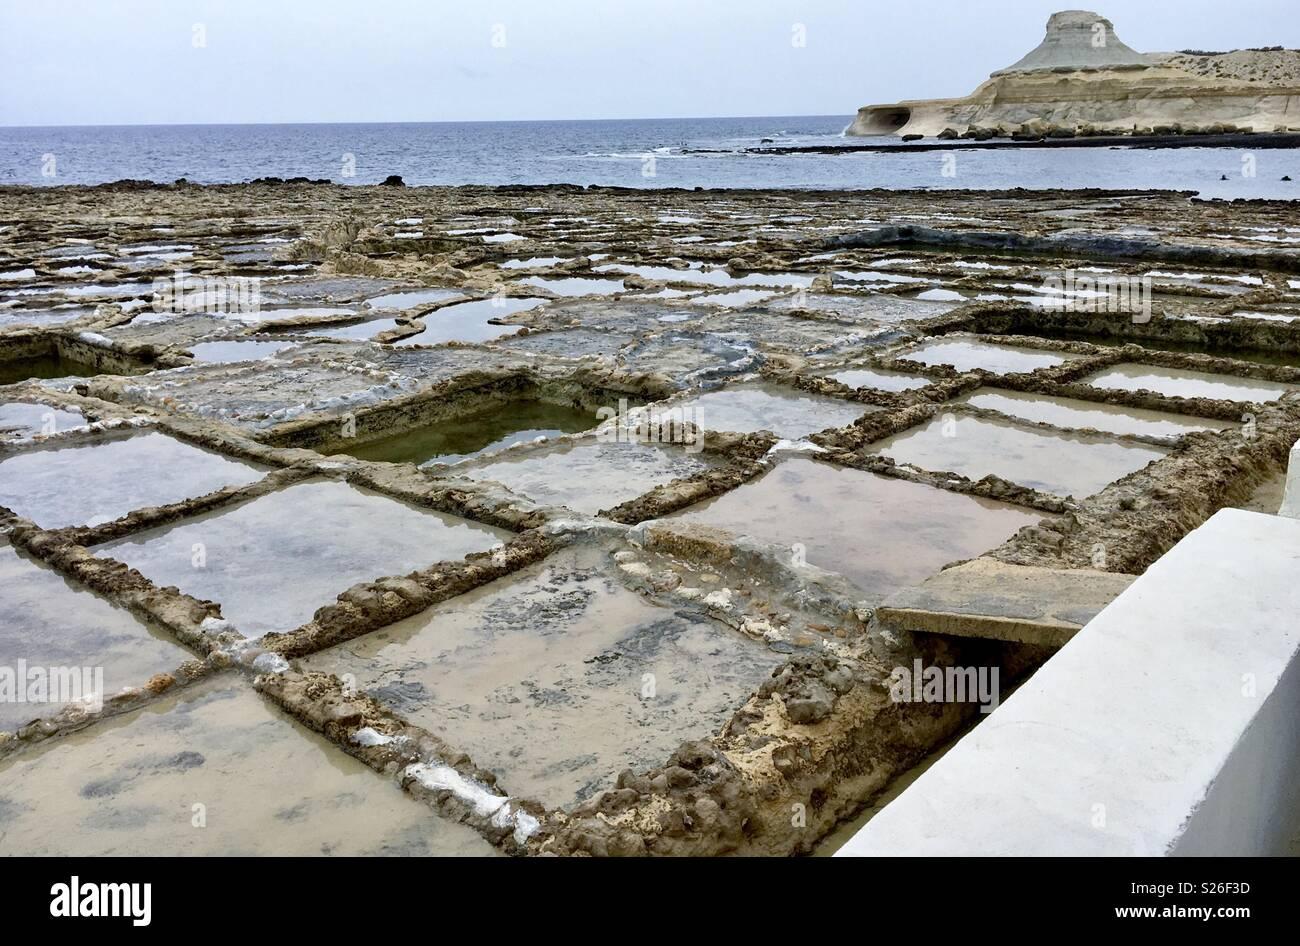 Gozo Malta - Stock Image